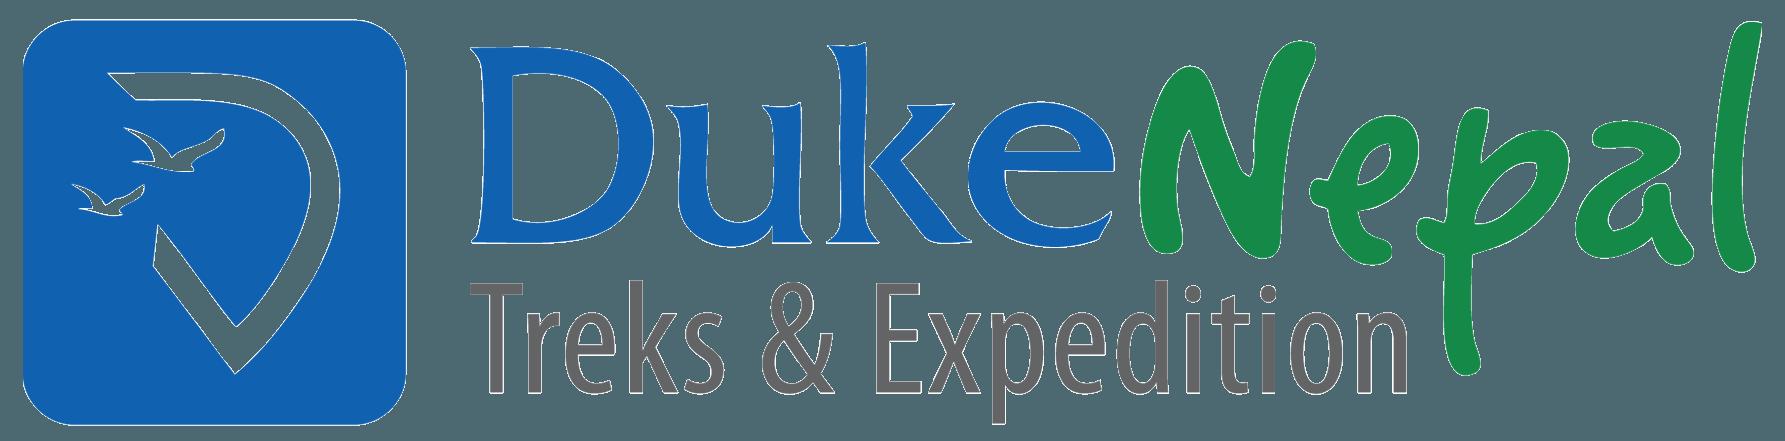 Trekking and Expedition in Nepal | Best Trekking Company in Nepal | Best Trekking Package with Reasonable Price | Adventure Tourism in Nepal |